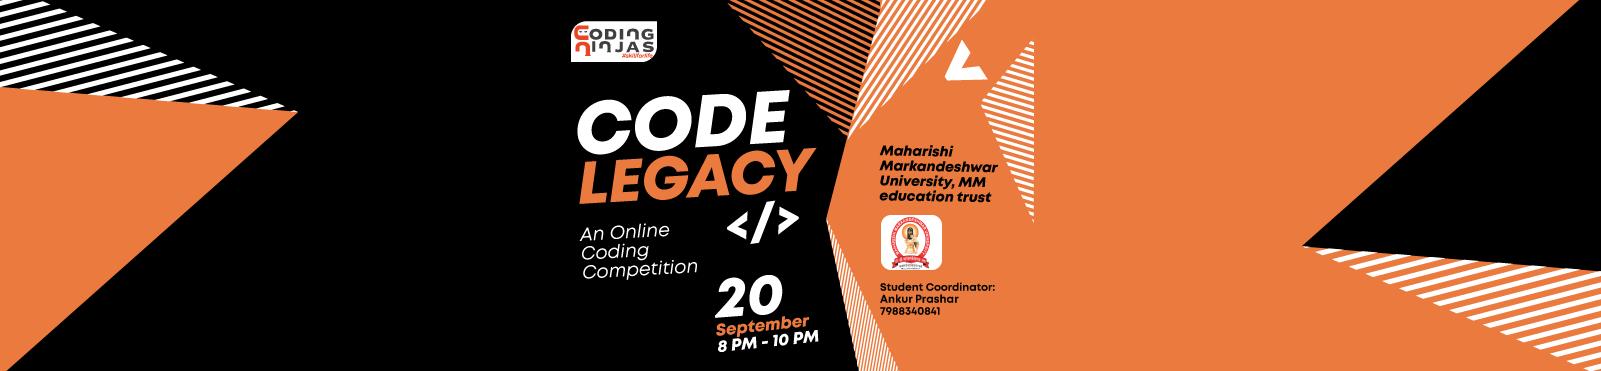 "Code Legacy at ""Maharishi Markandeshwar University, MM education trust """